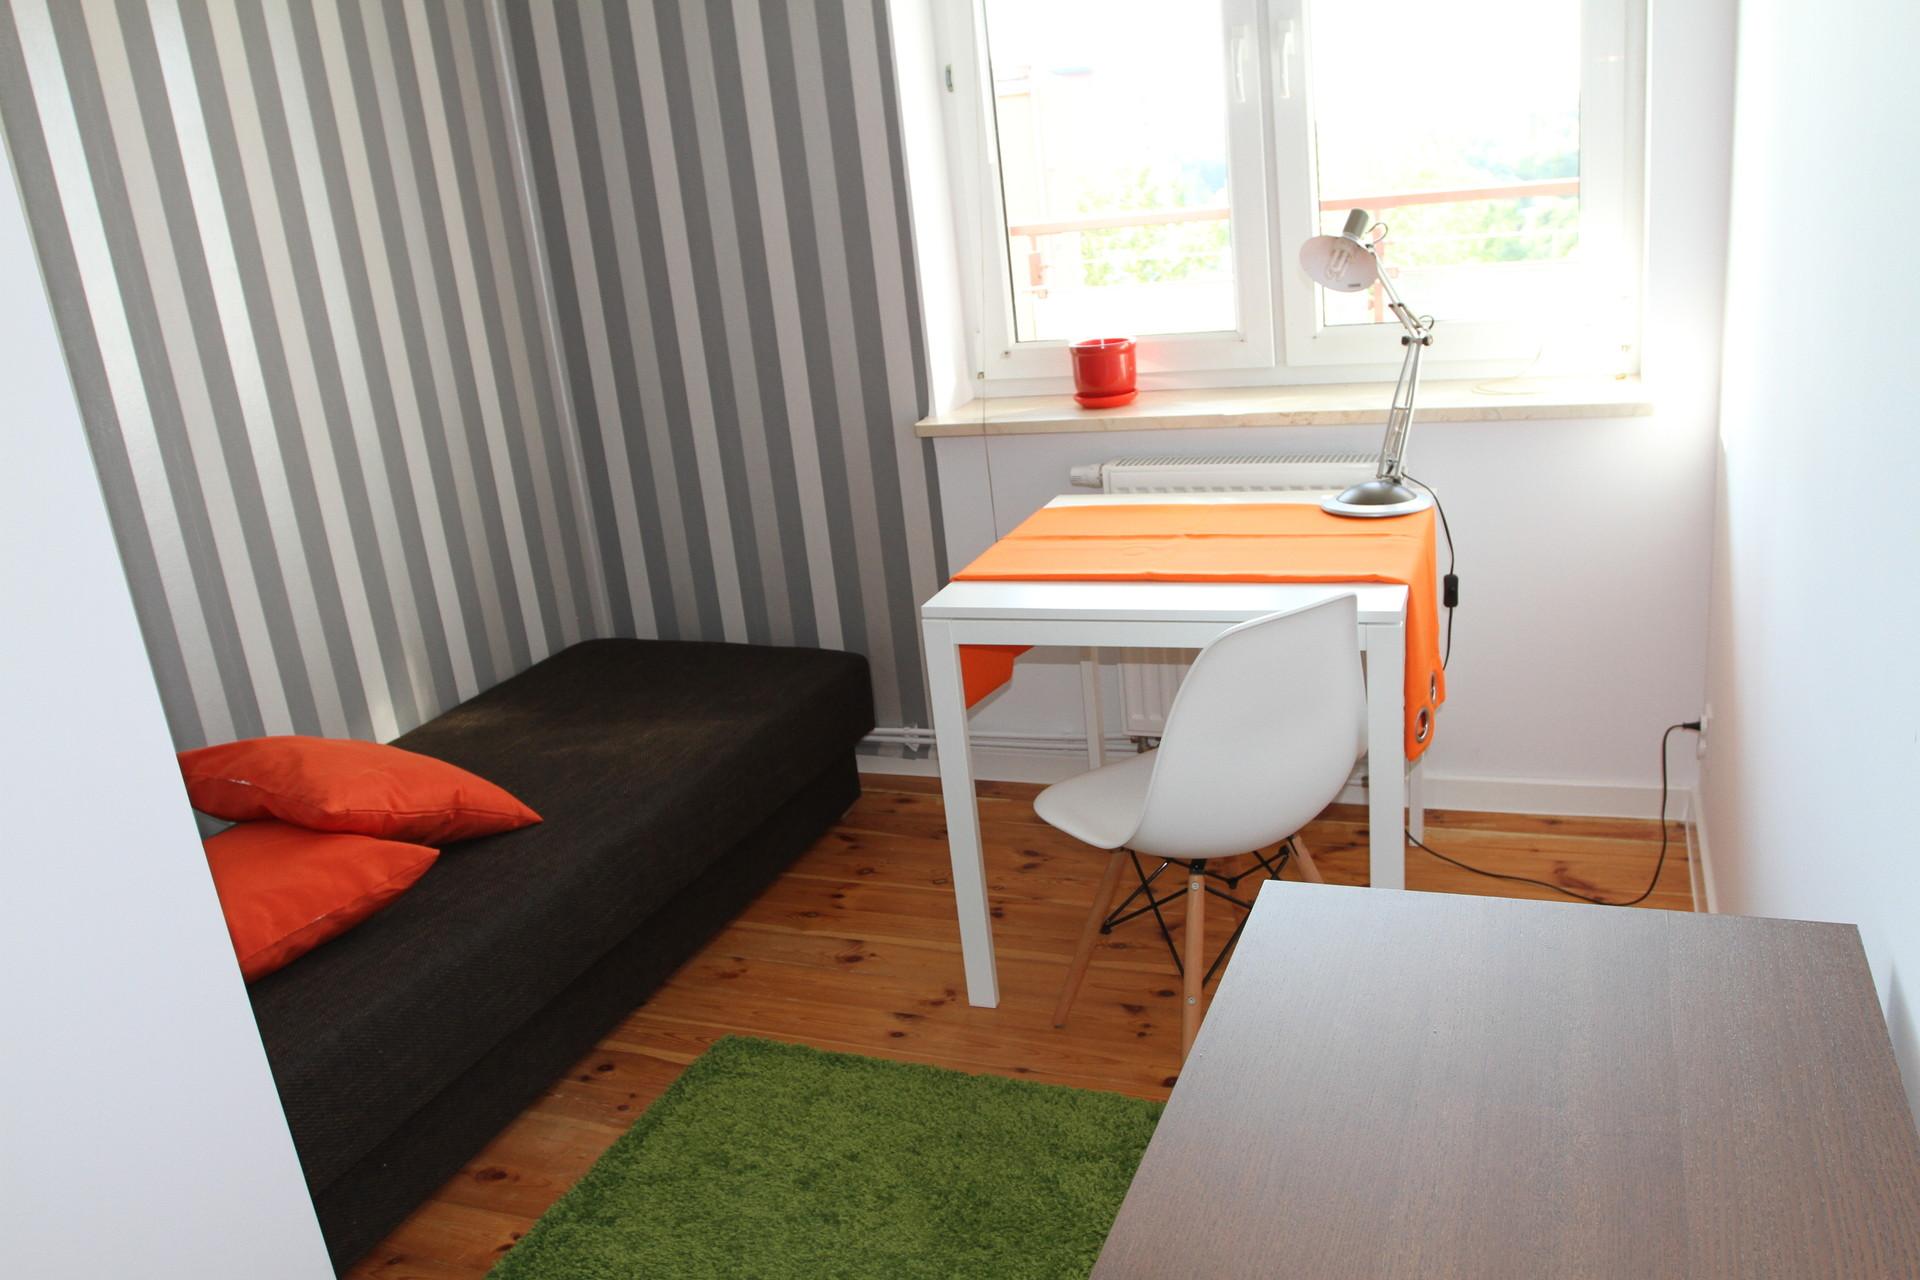 Sunny room in the new block in Warsaw